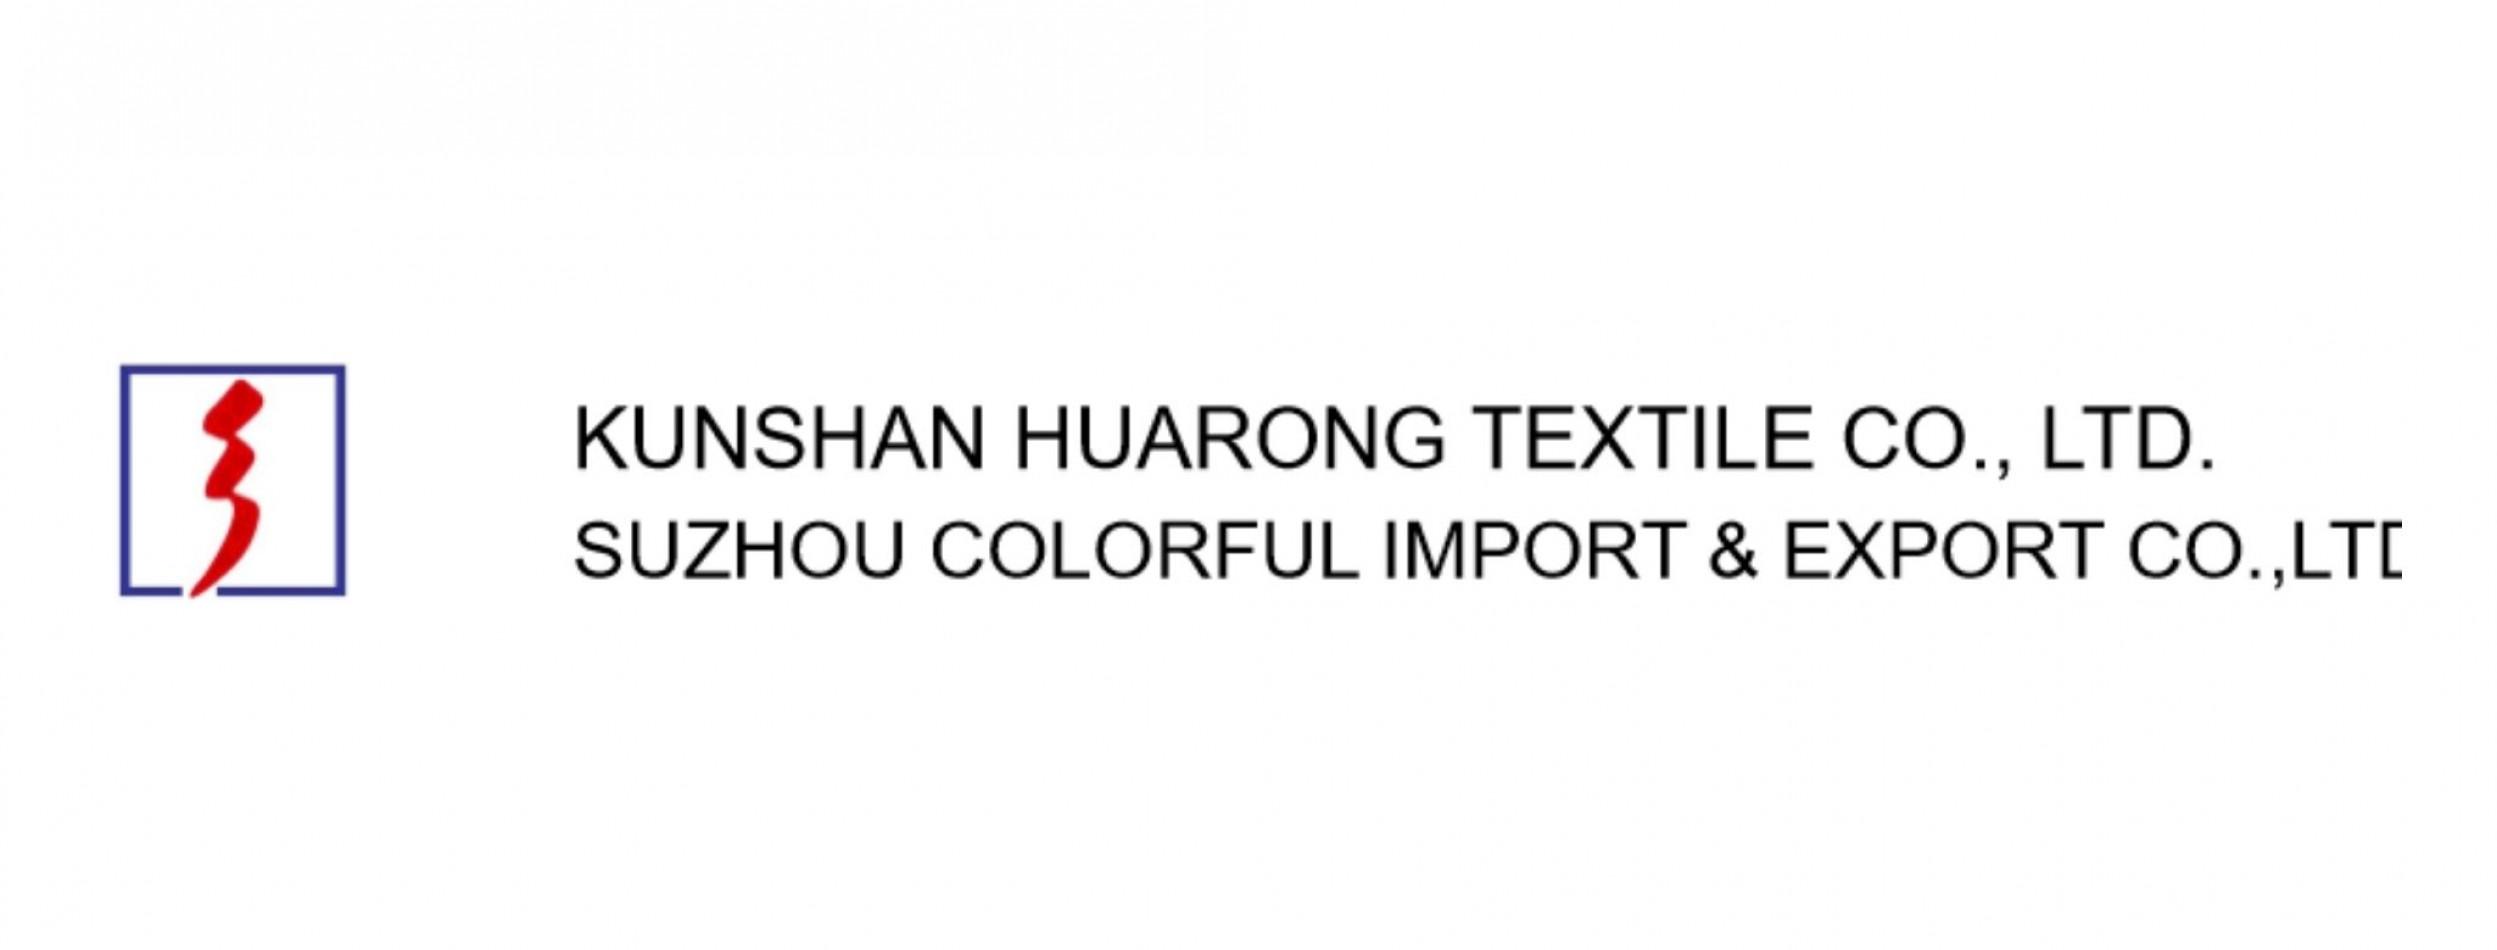 SUZHOU COLORFUL IMPORT & EXPORT CO., LTD. (HUARONGTEX)